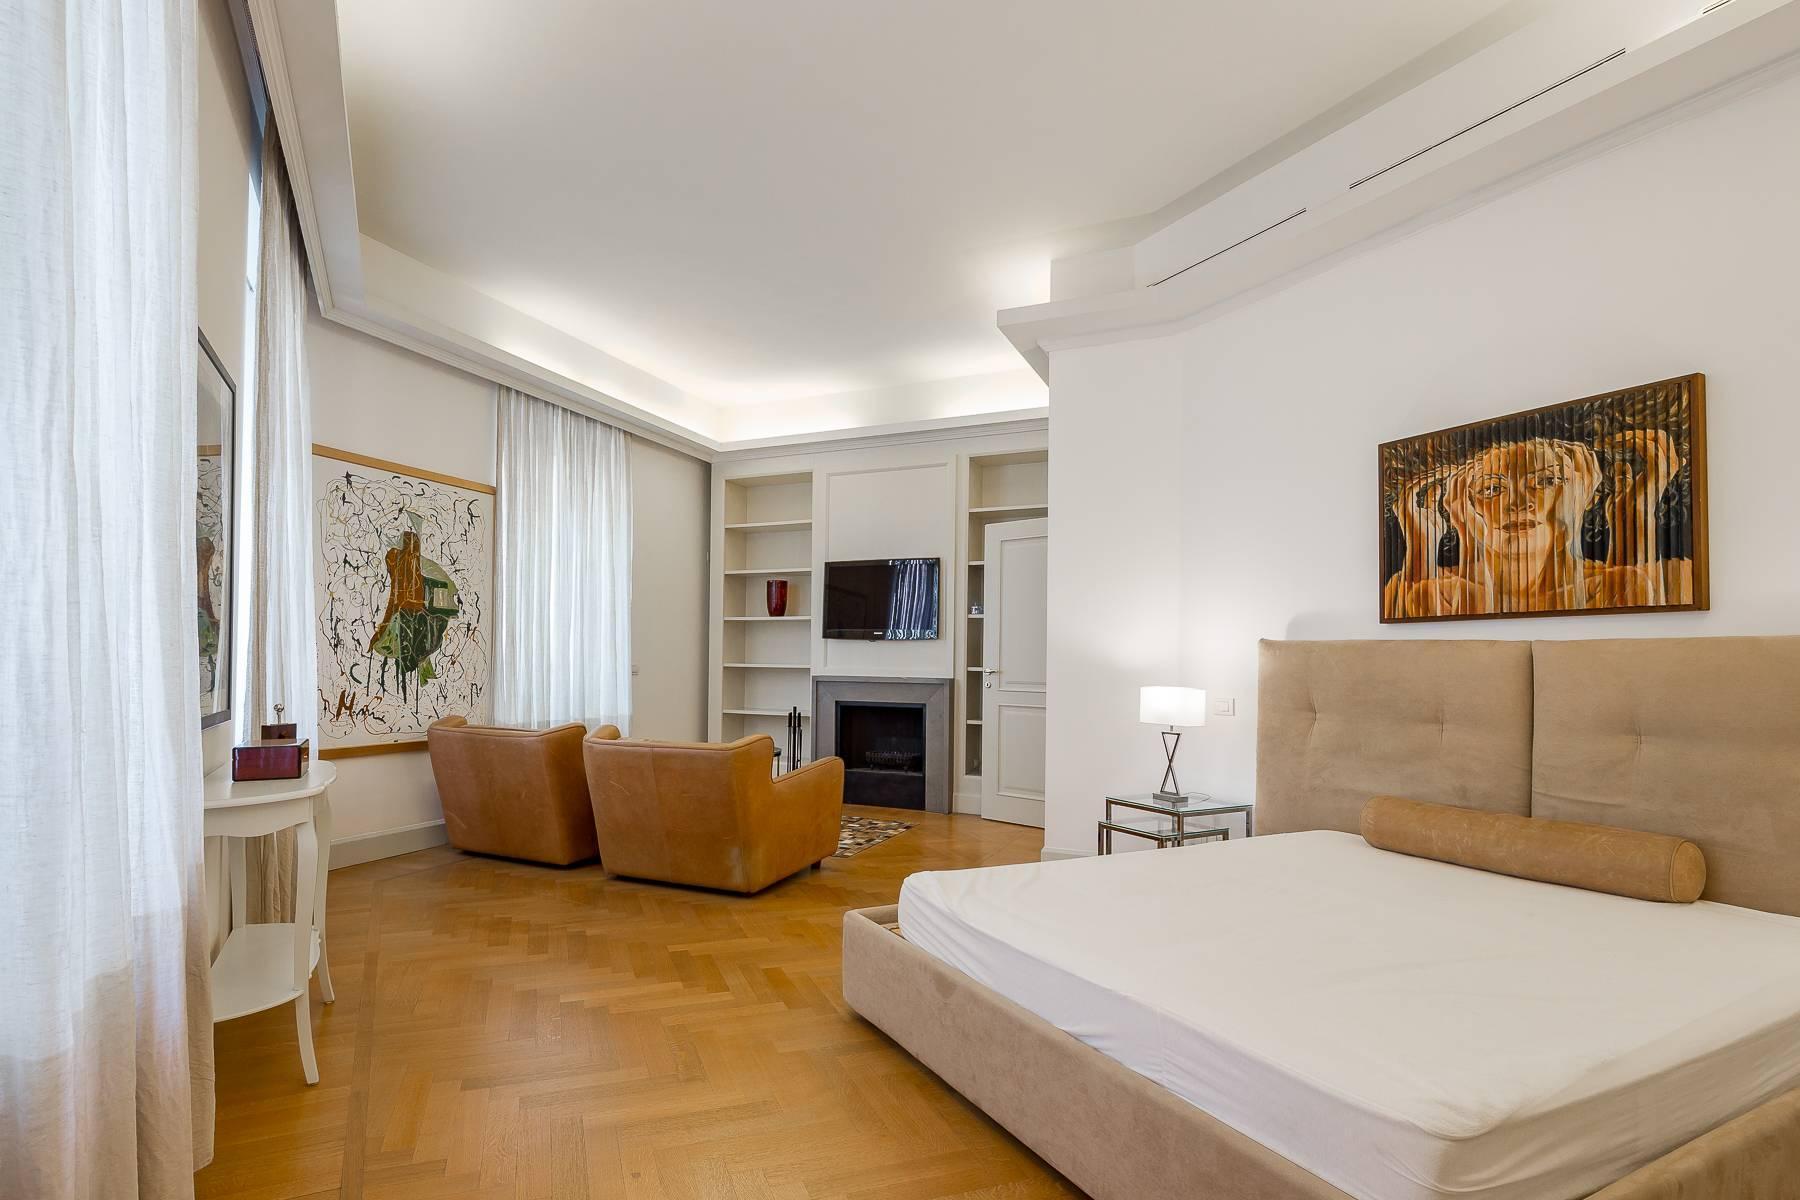 Prestigious penthouse in Piazza Mondadori of 500 square meters - 20